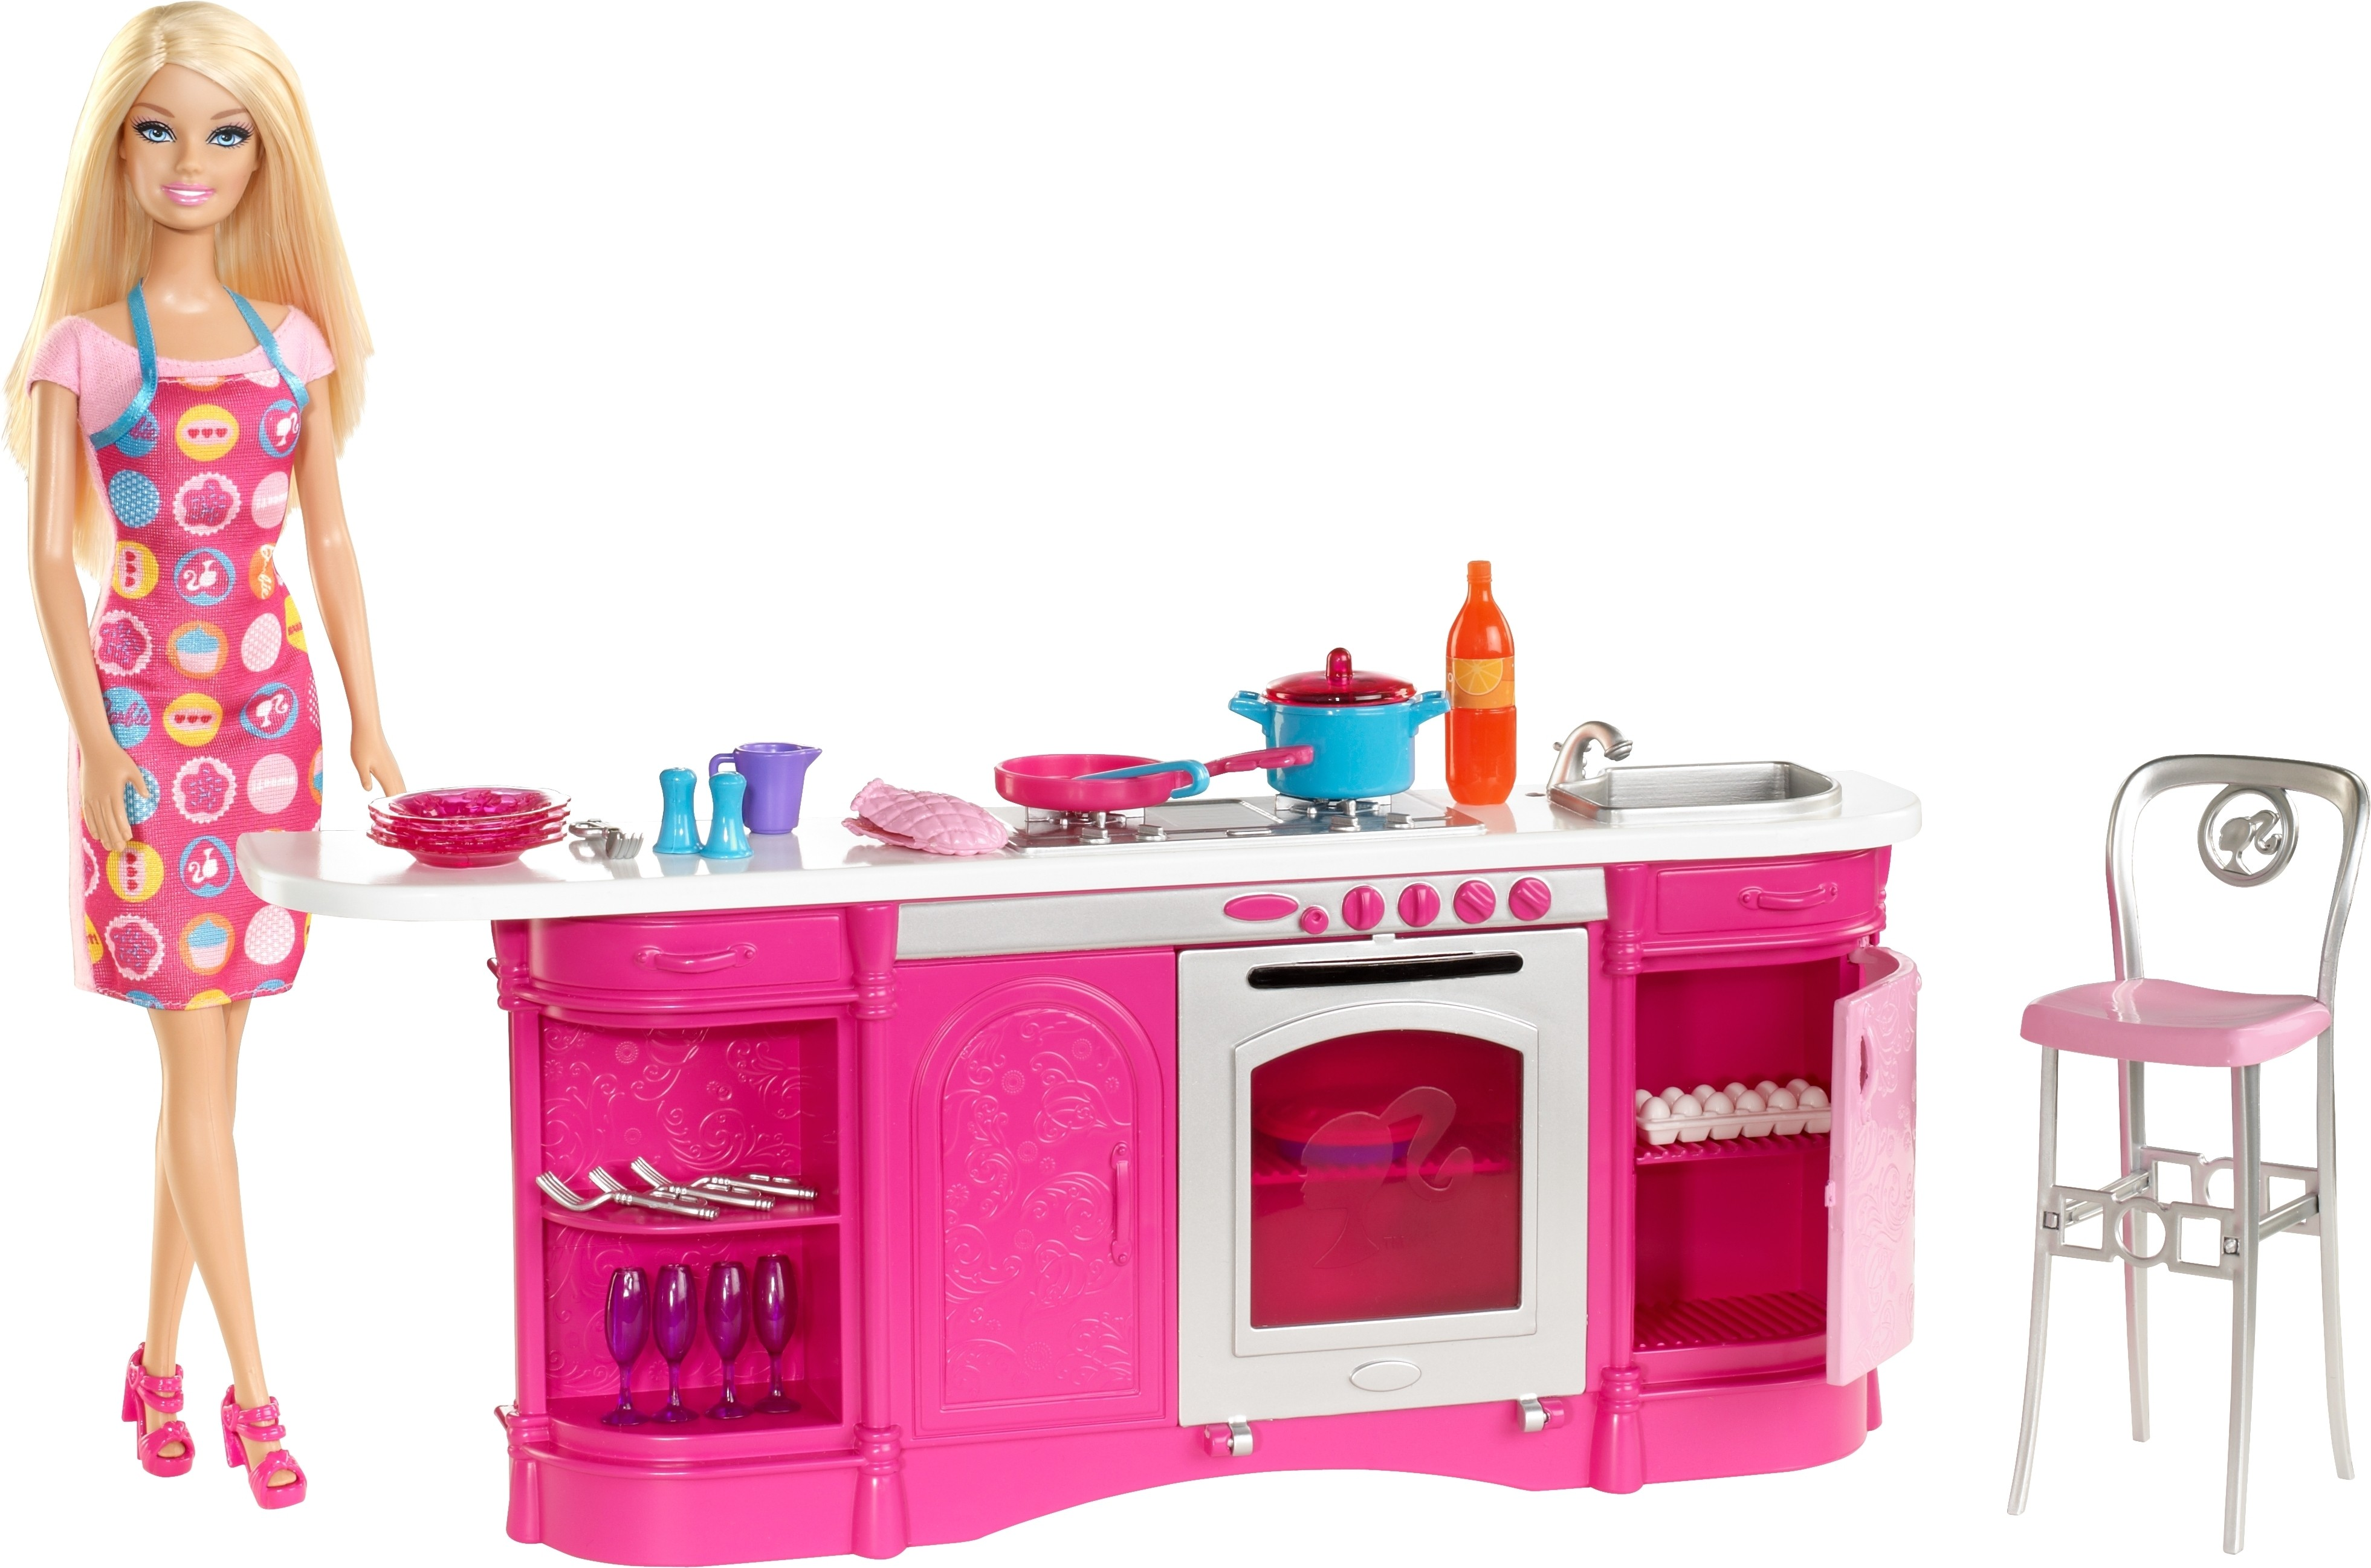 Barbie cooking fun kitchen cooking fun kitchen shop for Kitchen set india